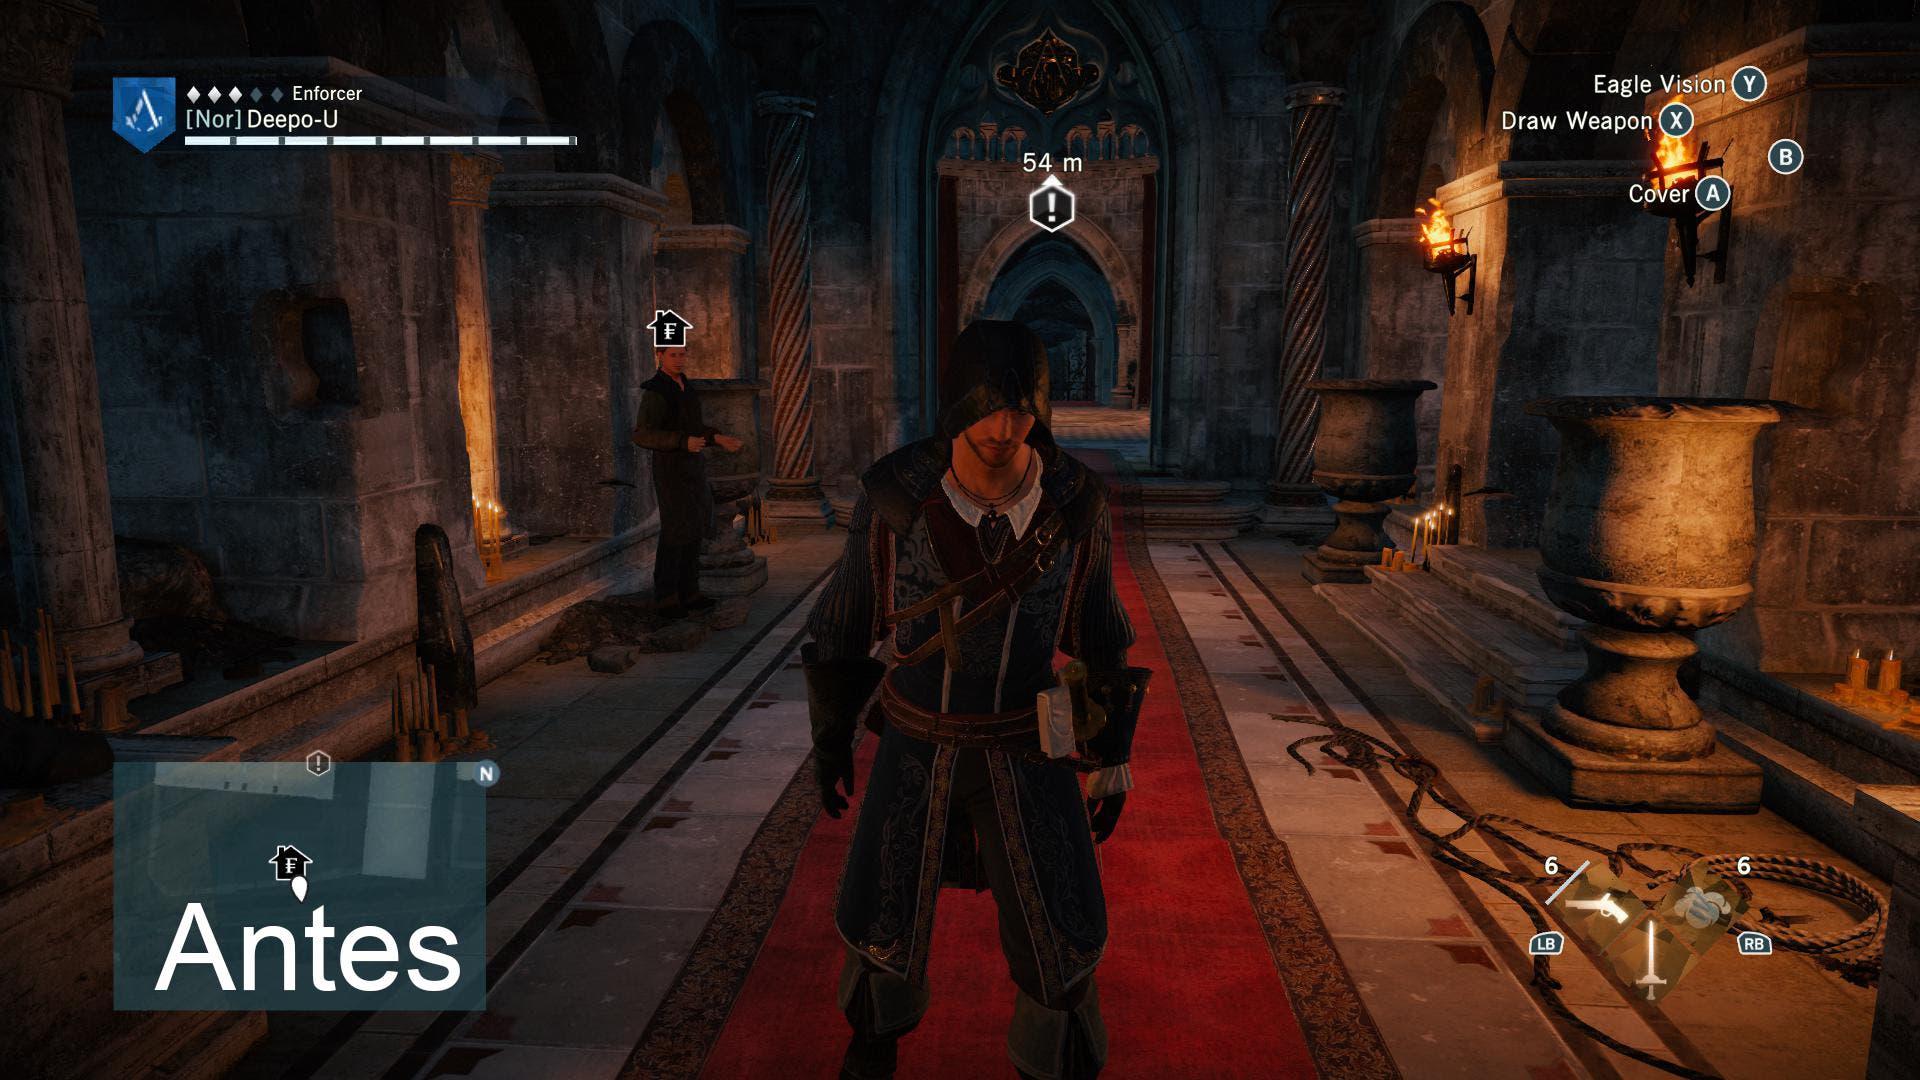 assassins-creed-unity-pc-comparison-screen-4